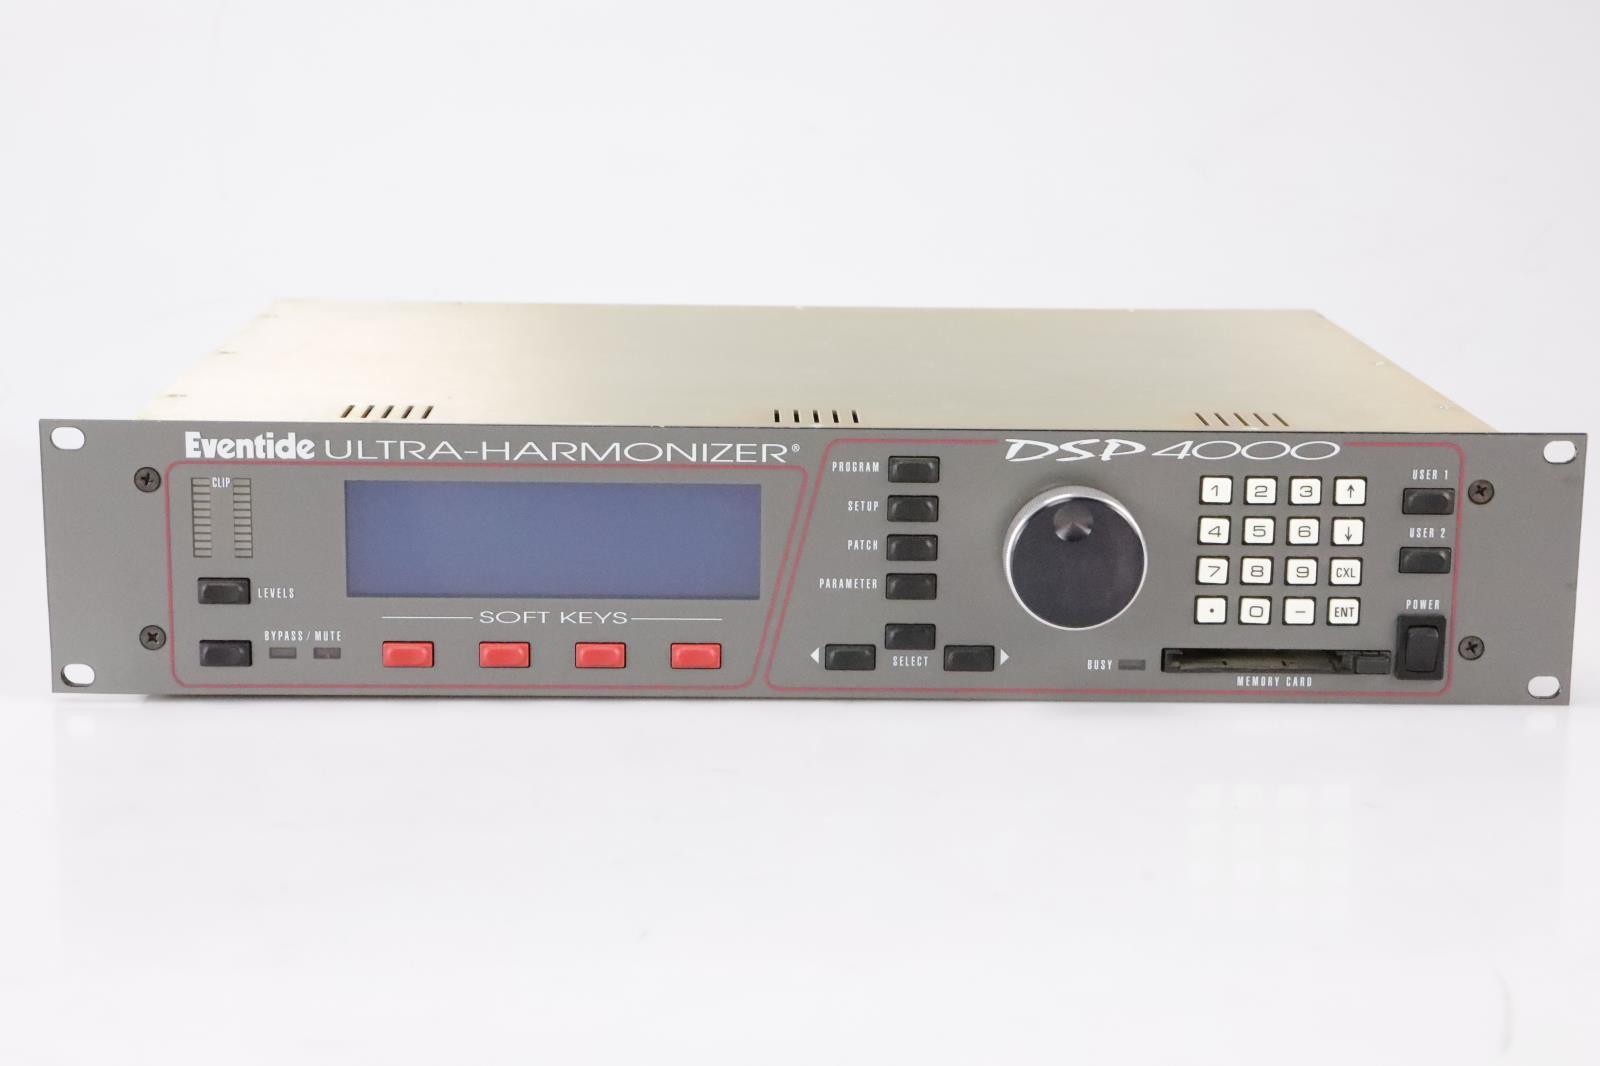 Eventide DSP 4000 Ultra-Harmonizer Digital Audio Processors Rev. 2.0 #35666